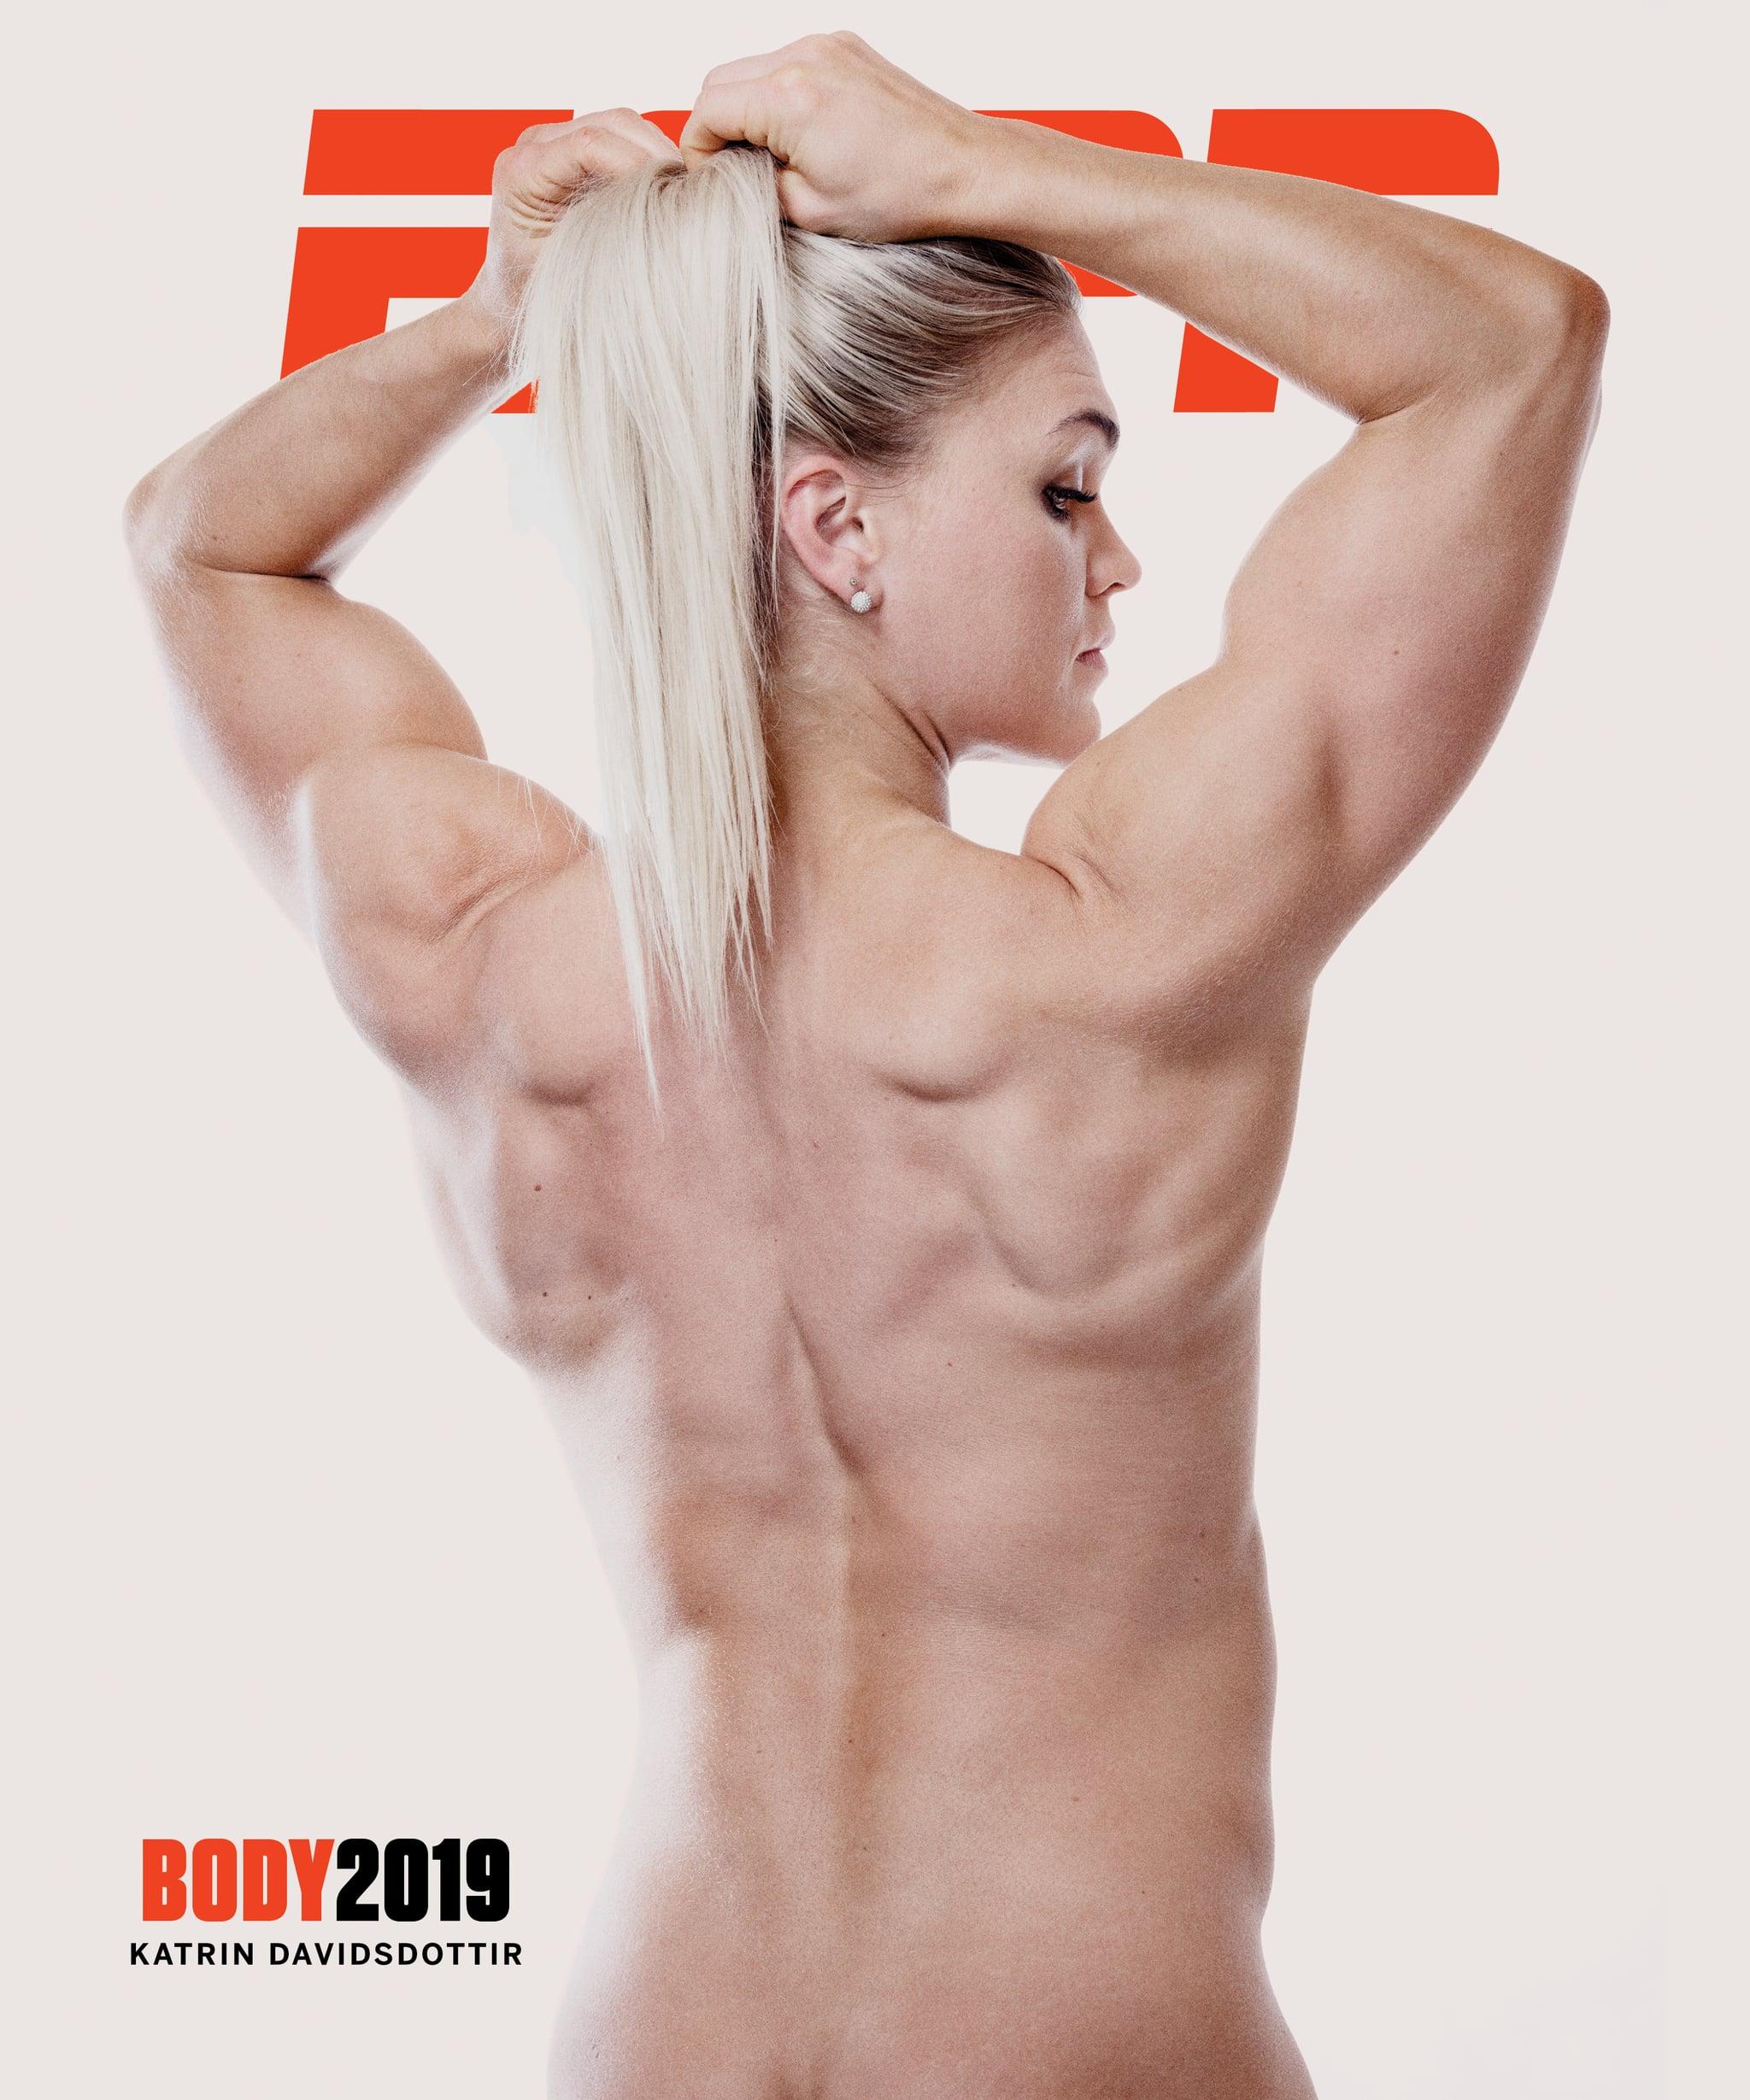 Espn Naked Edition photo 28